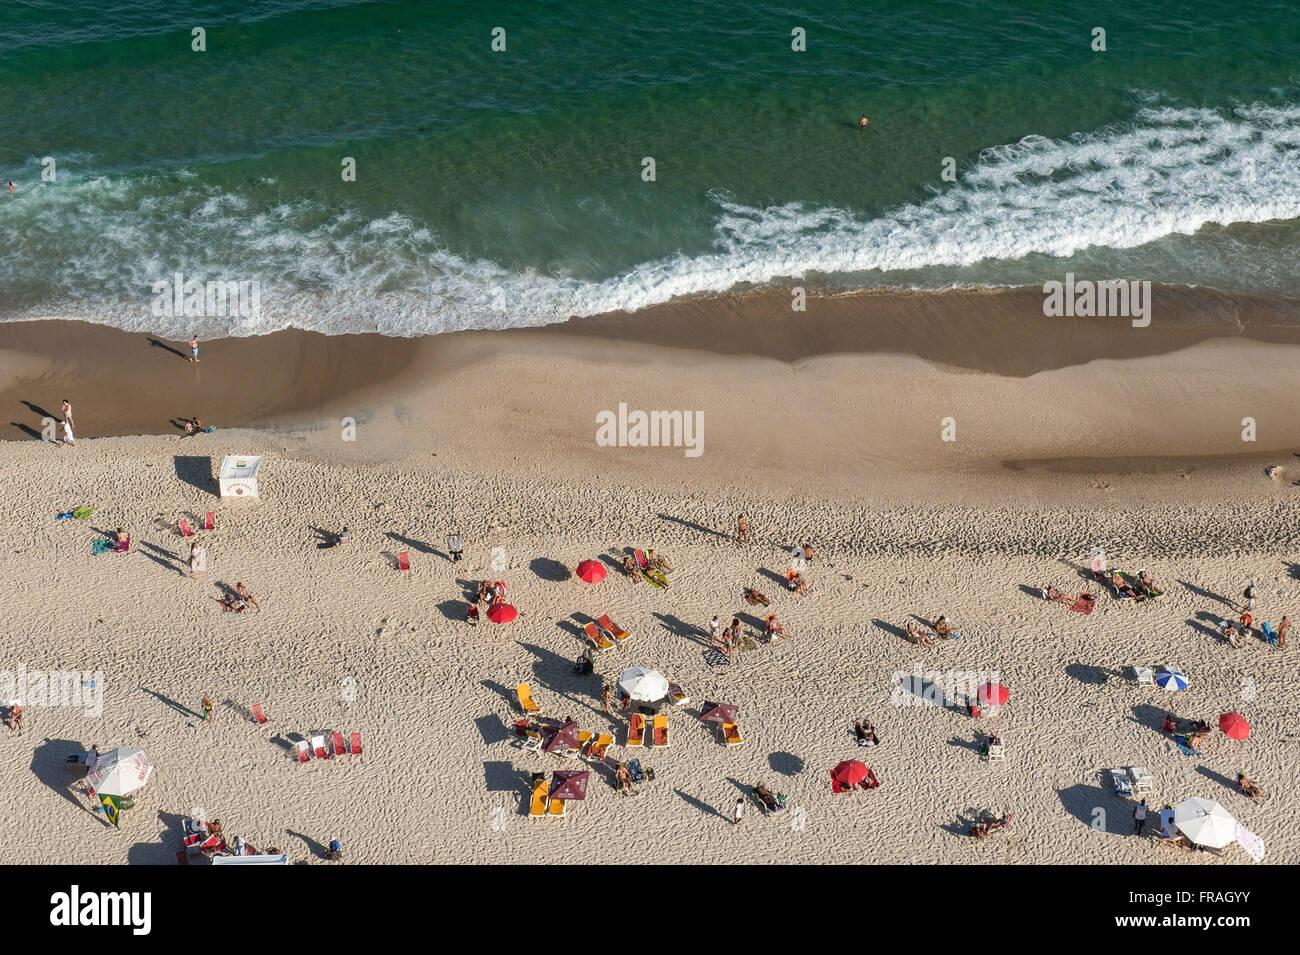 Top view of sunbathers on Ipanema Beach - Stock Image